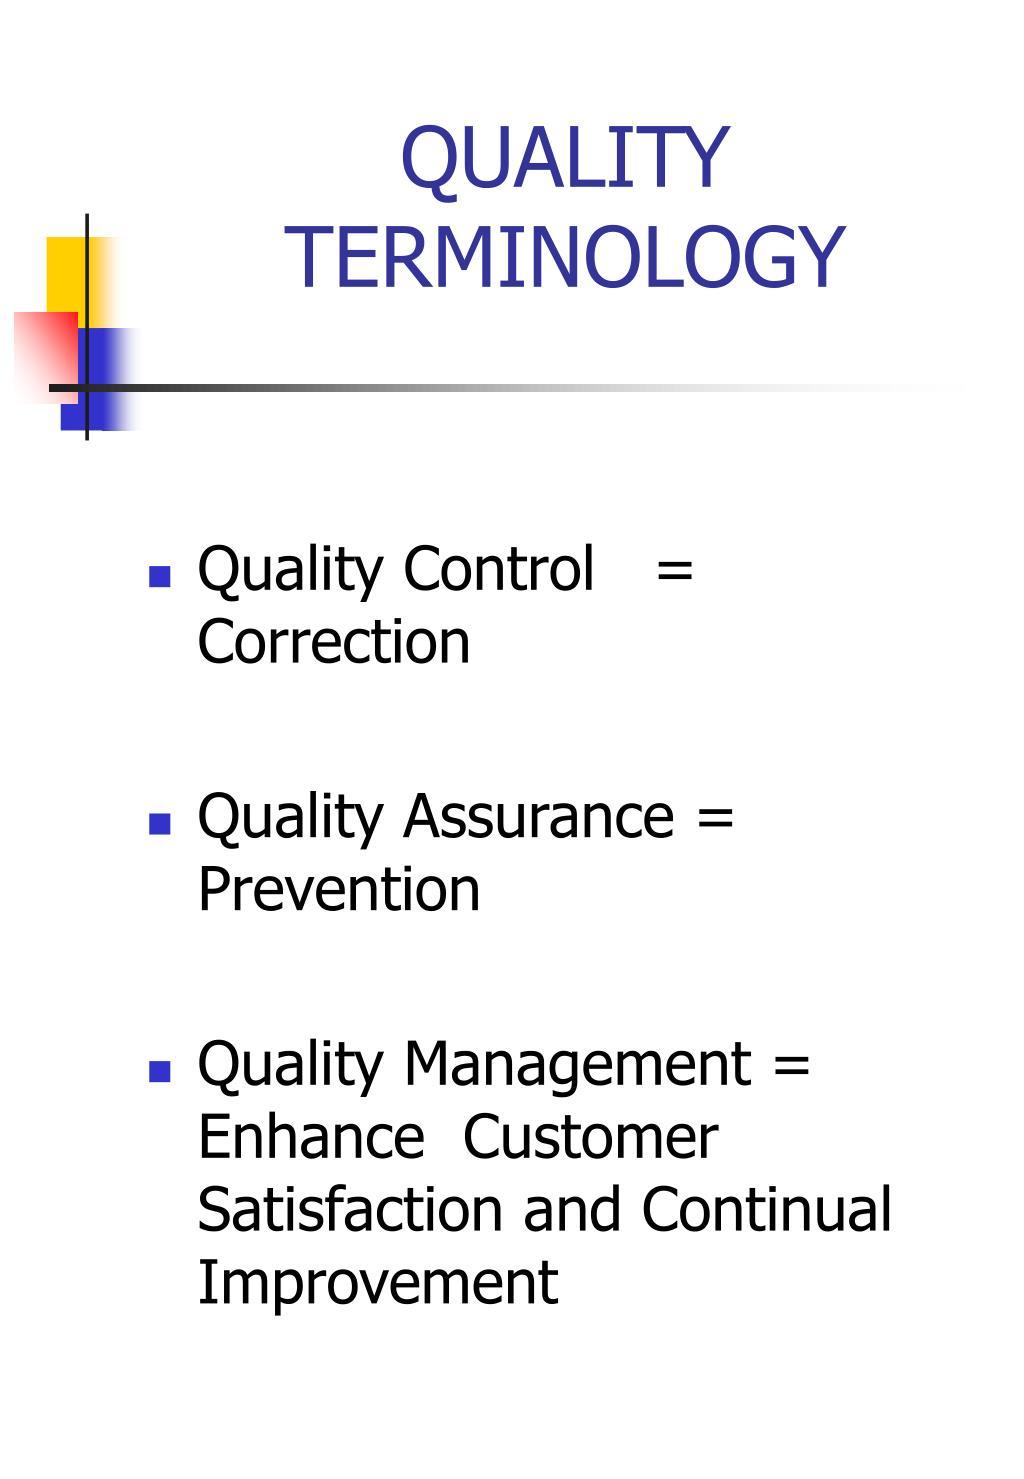 QUALITY TERMINOLOGY